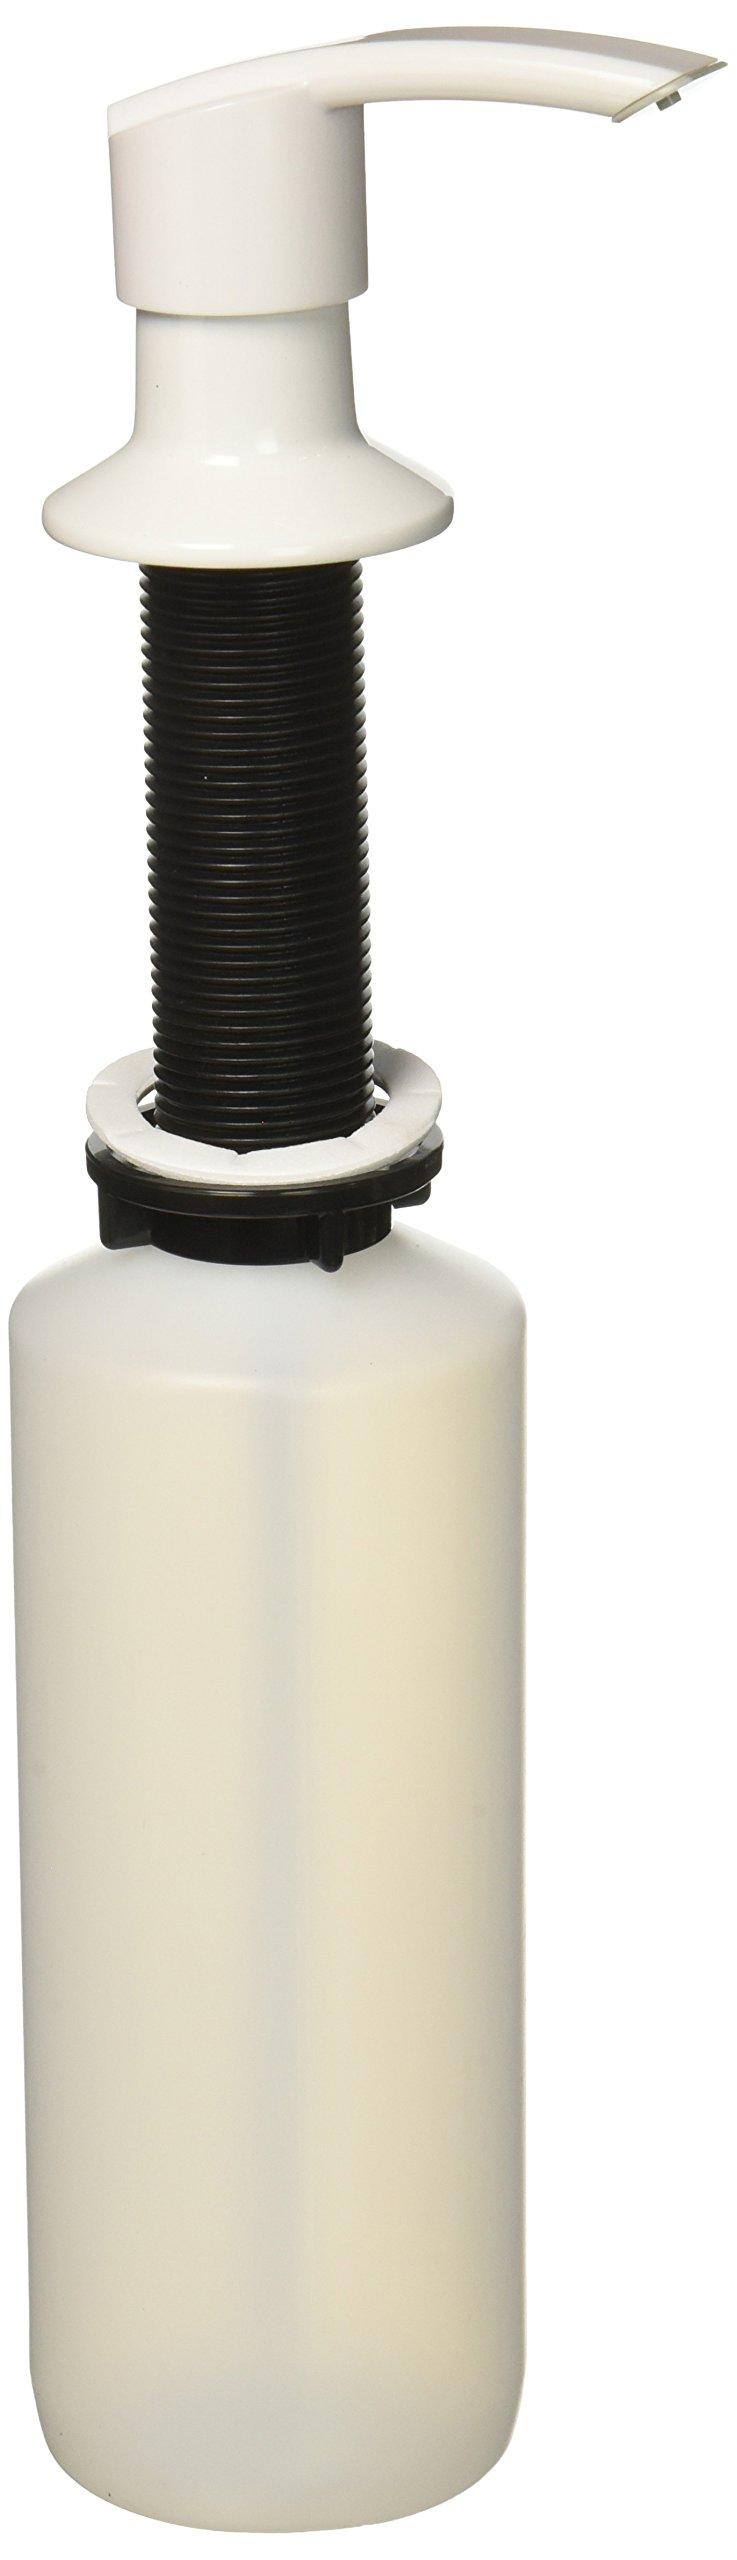 Pfister KSDLCWW Soap Dispenser, White